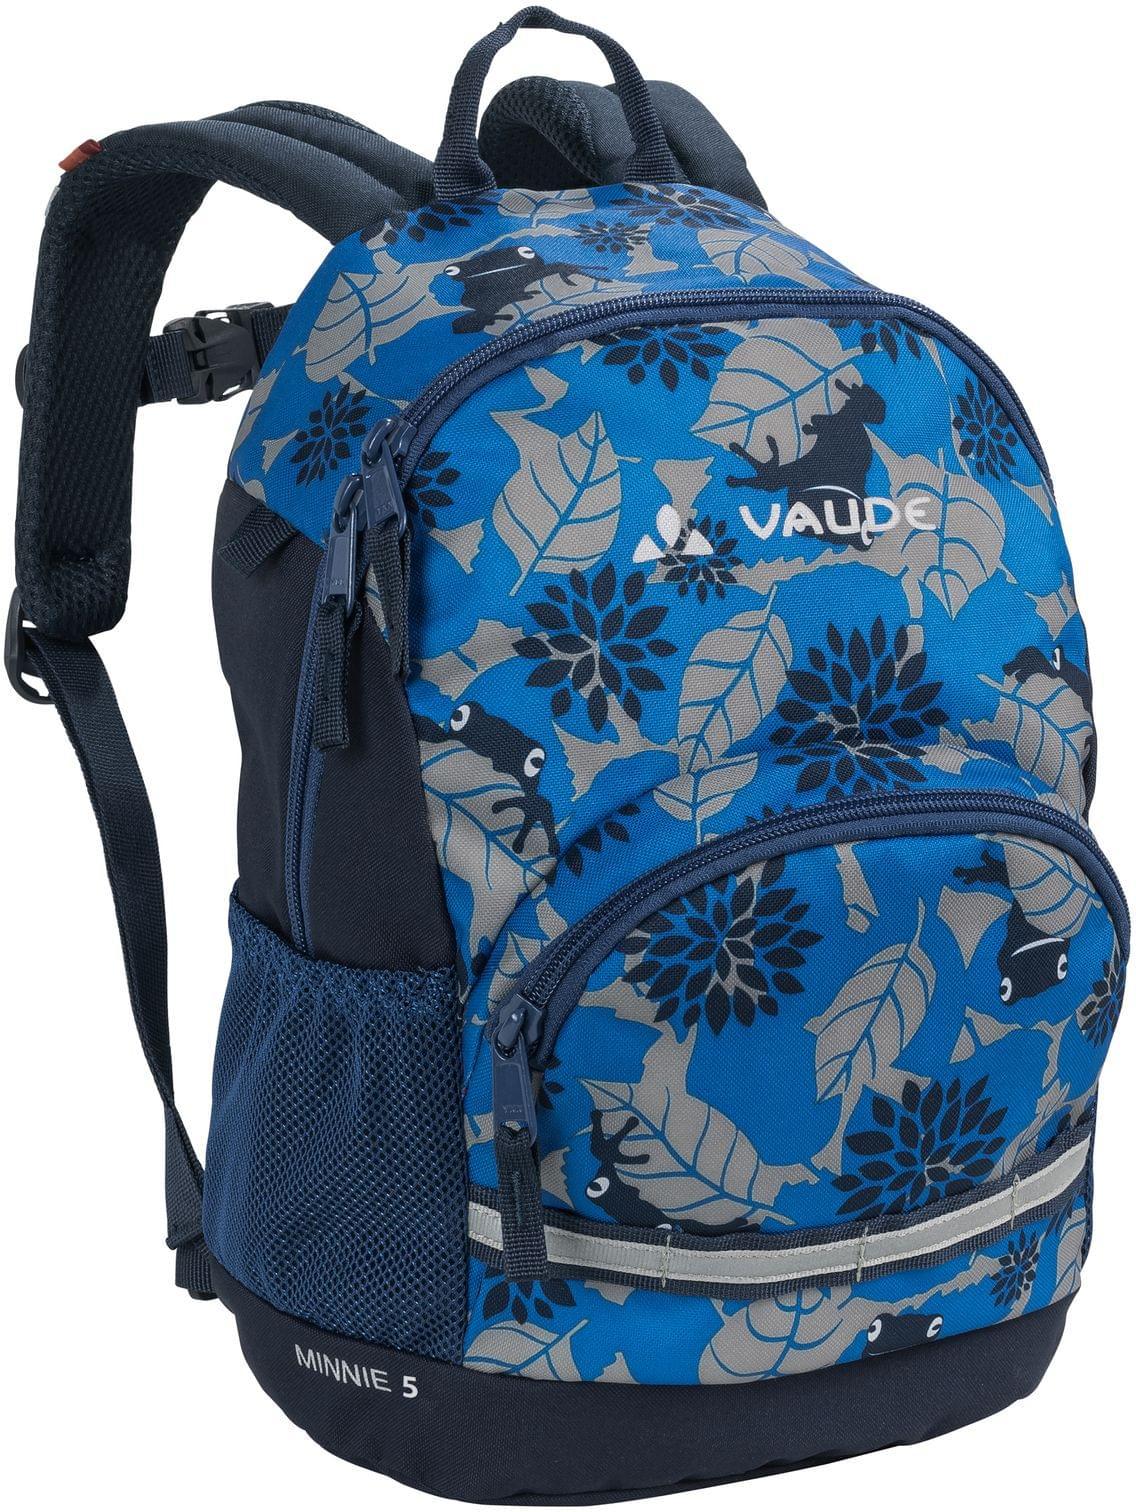 24184ba2879 Dětský batoh Vaude Minnie 5 - radiate blue - Skibi Kids